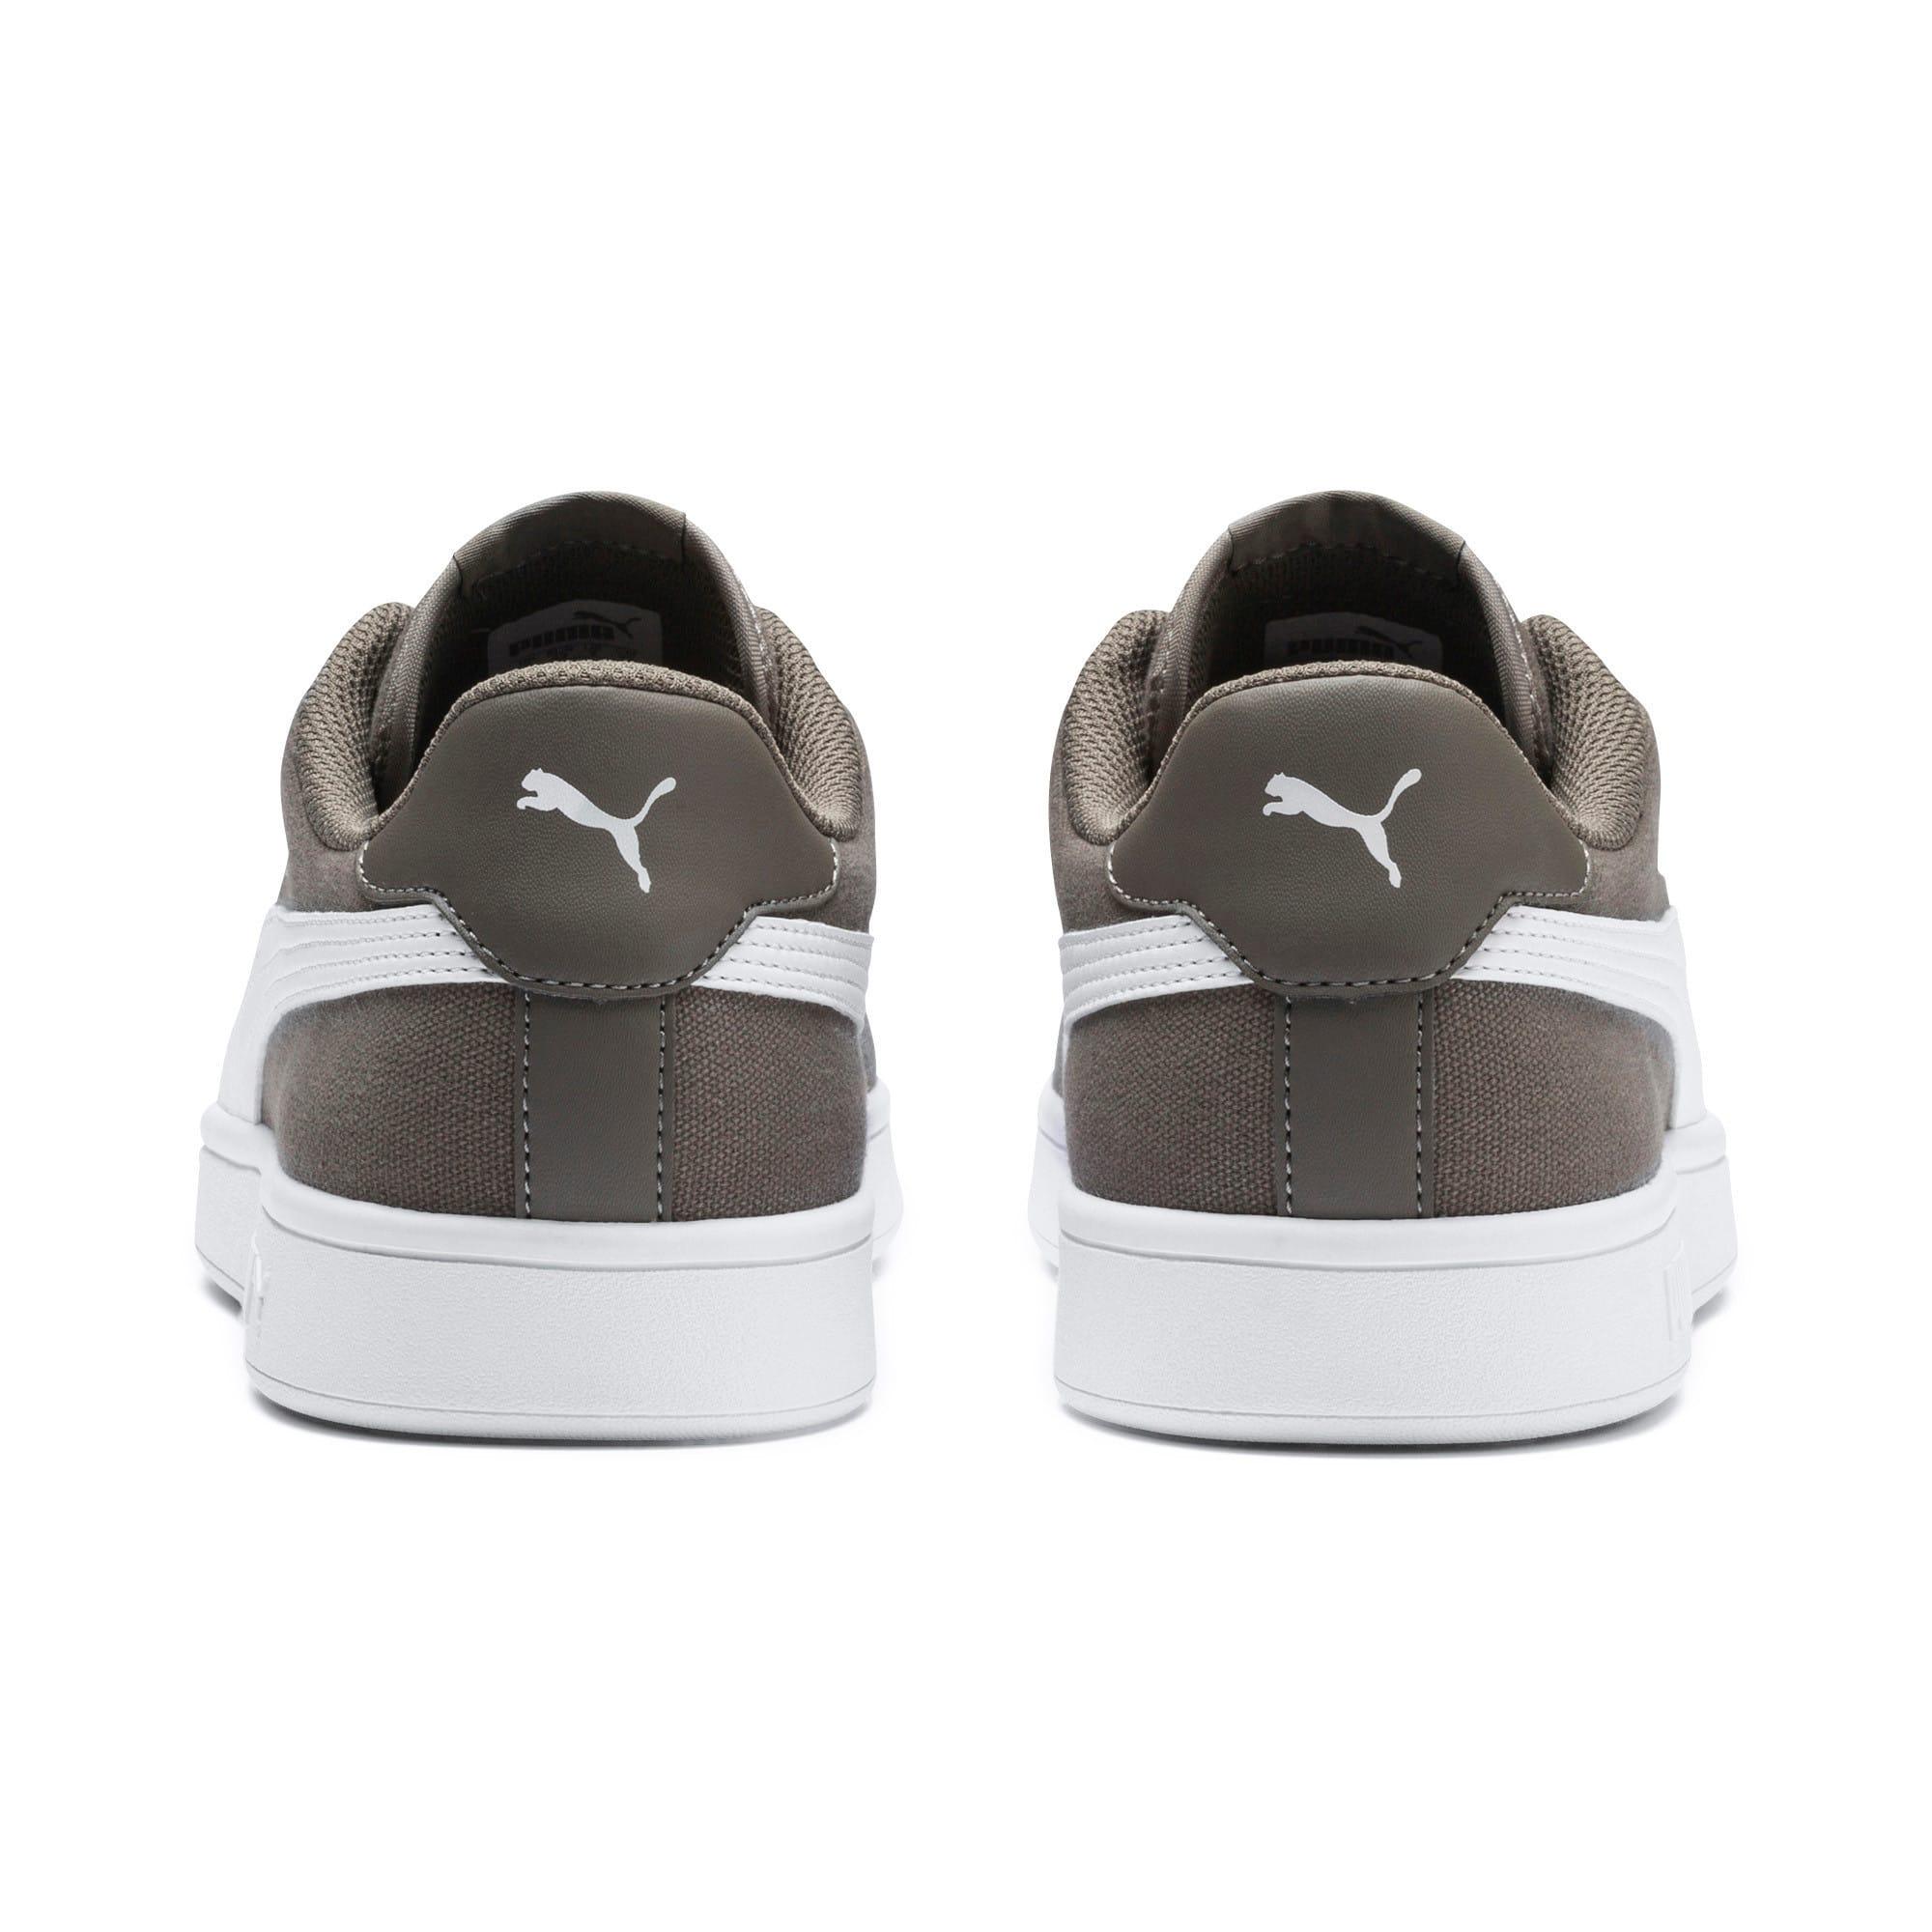 Thumbnail 3 of PUMA Smash v2 Sneakers, Charcoal Gray-Puma White, medium-IND